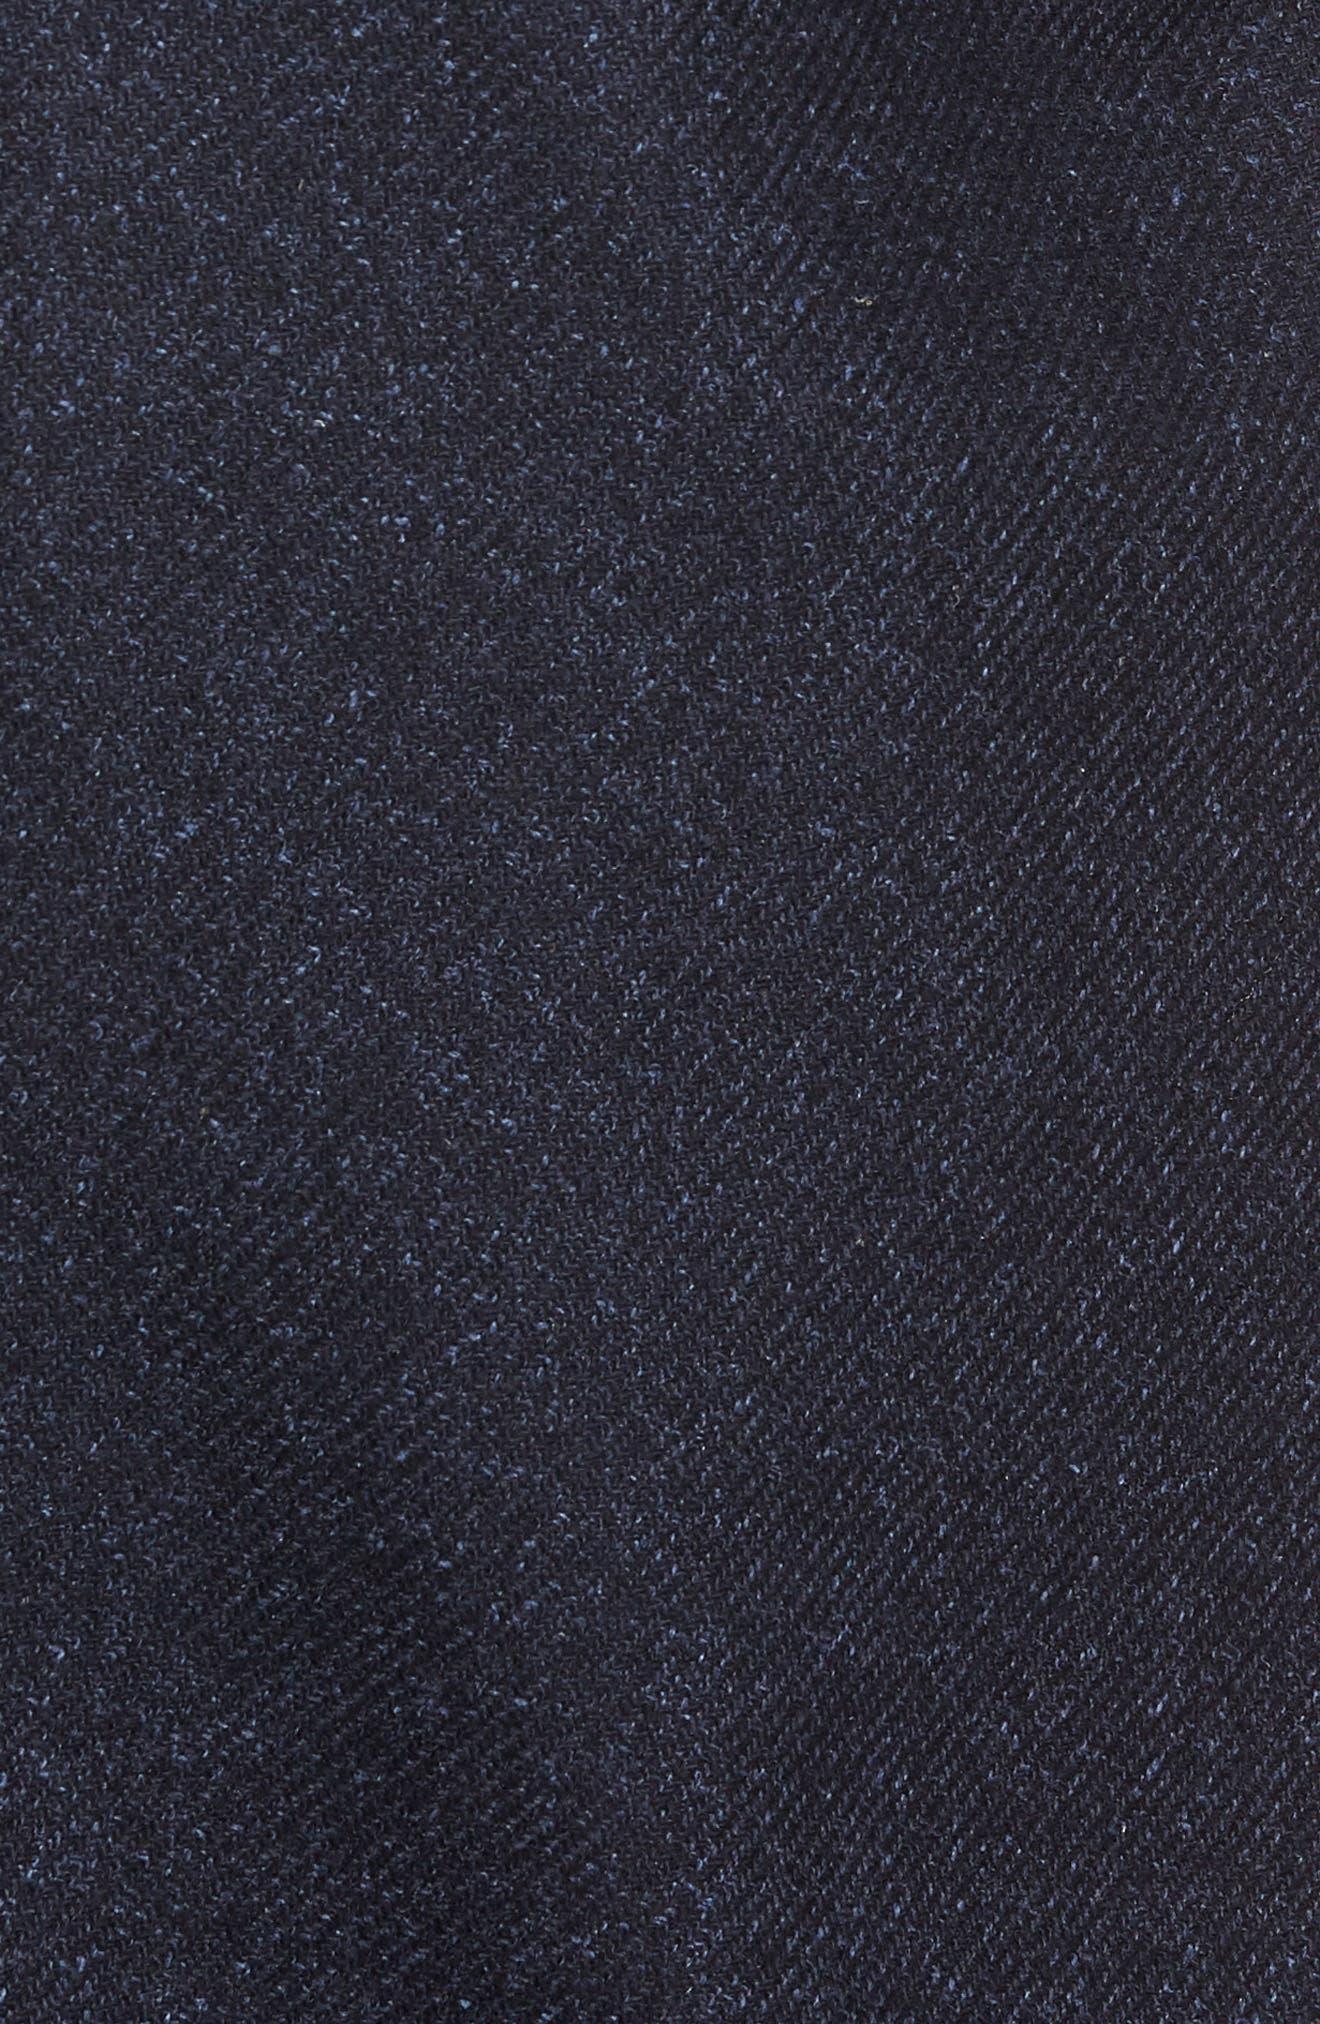 Destination Water Resistant Tweed Topcoat,                             Alternate thumbnail 7, color,                             400